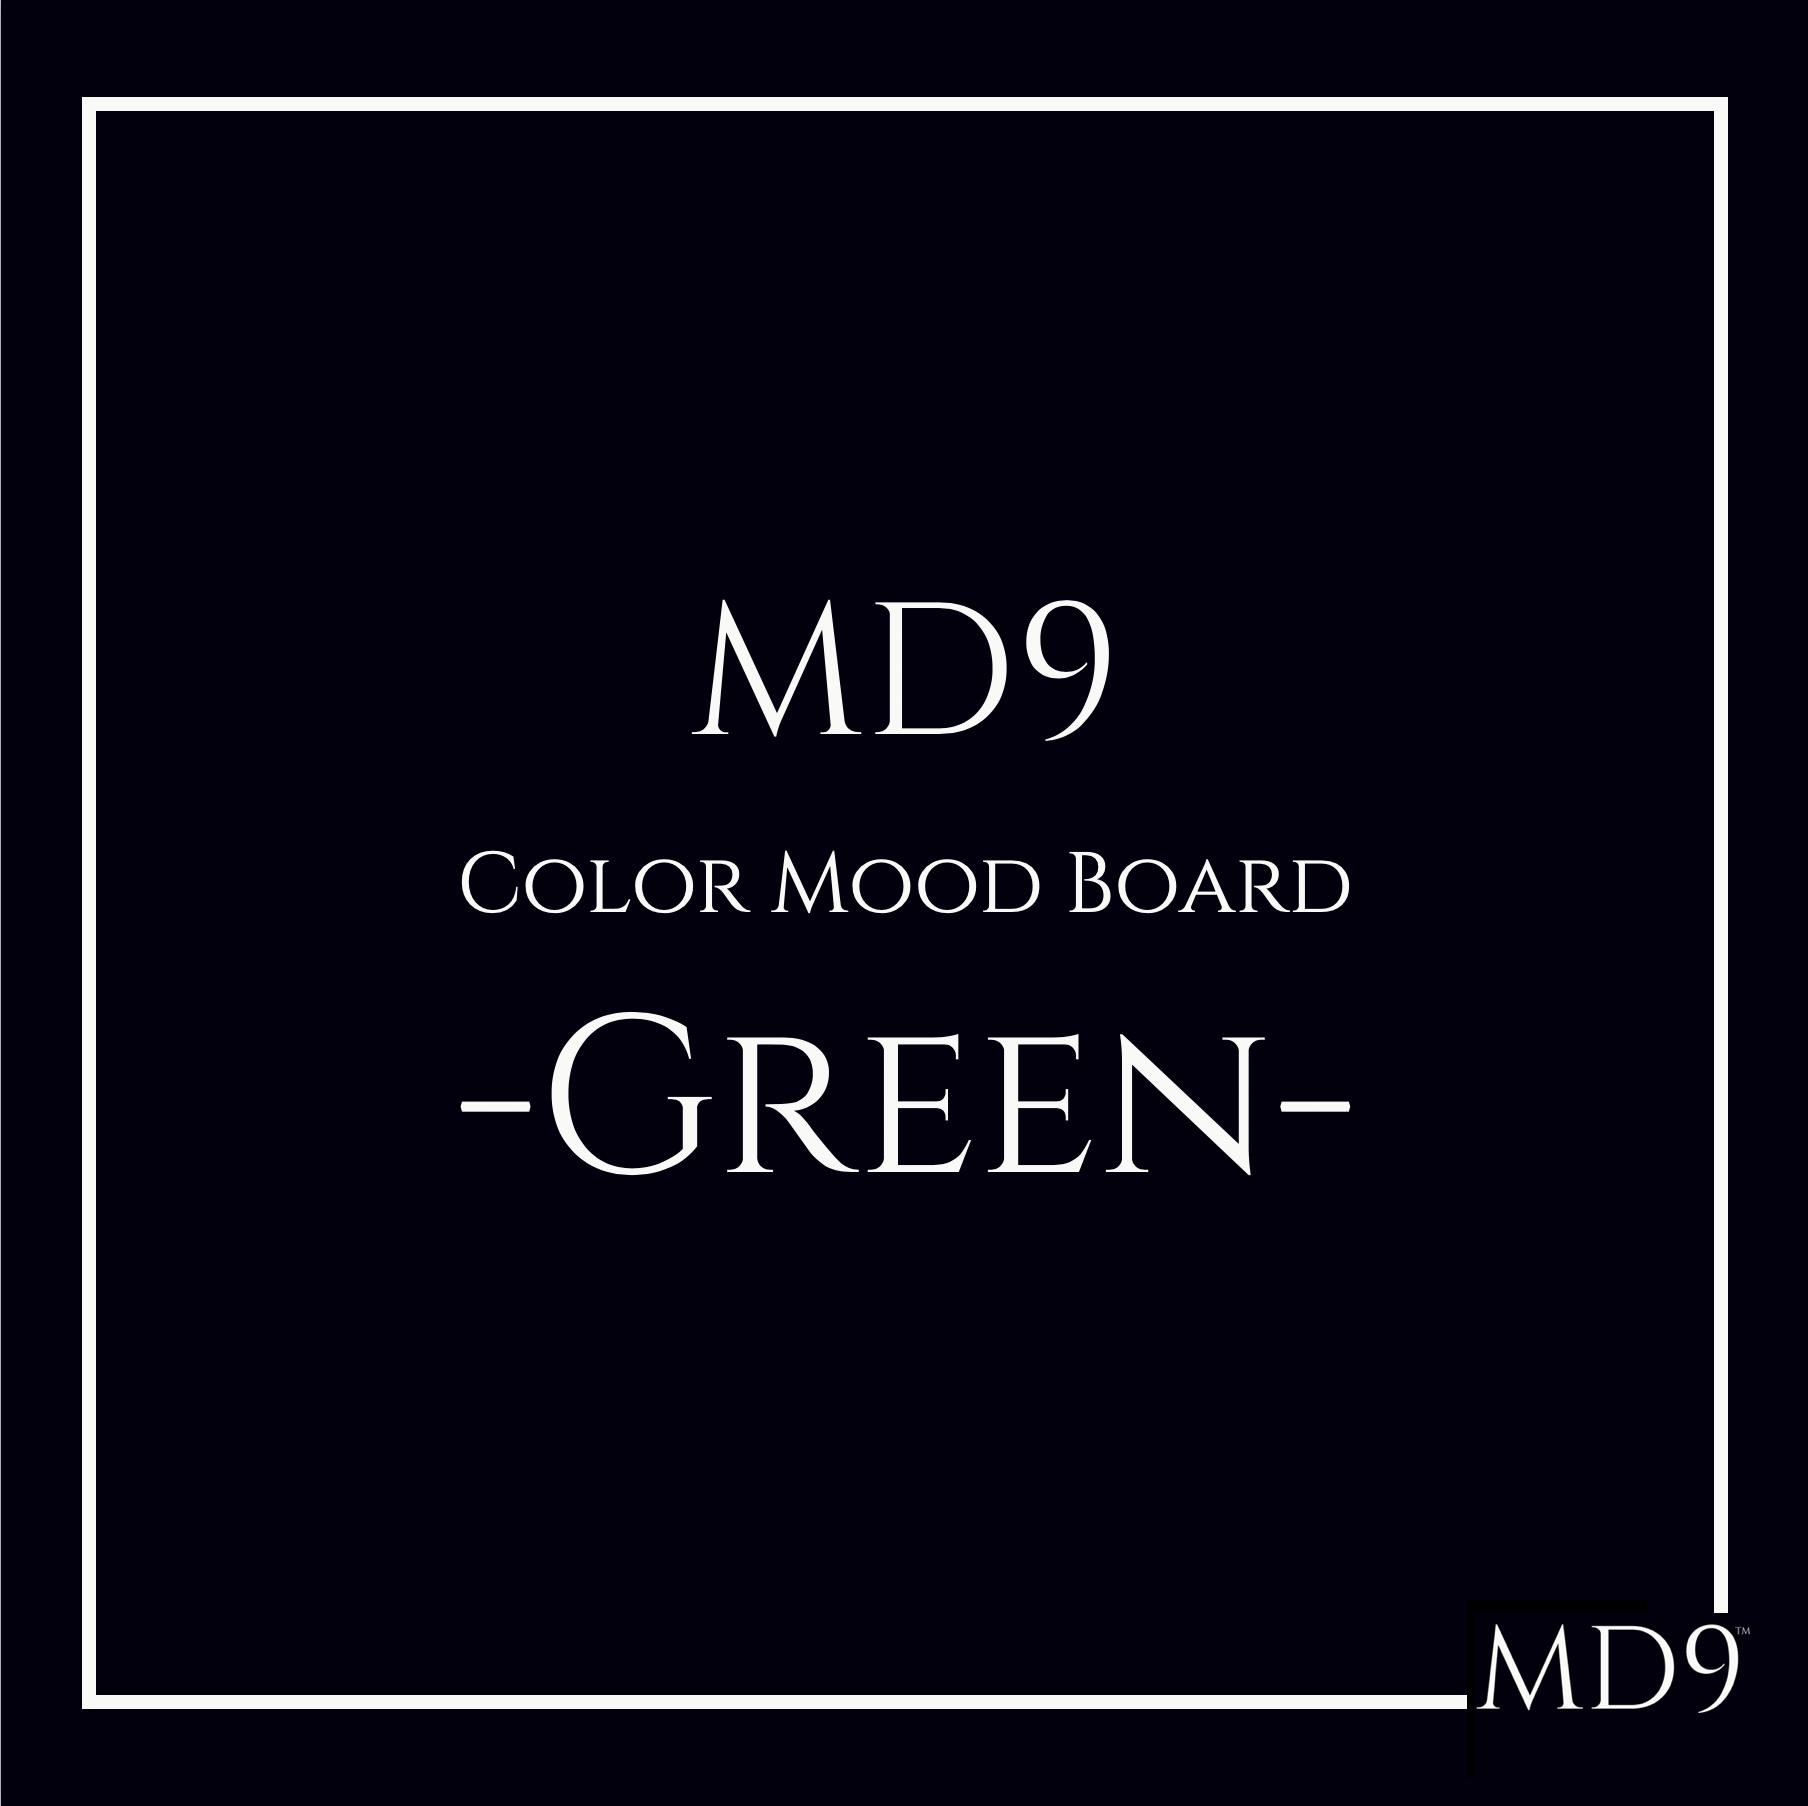 MD9's Colors Mood Board – Green